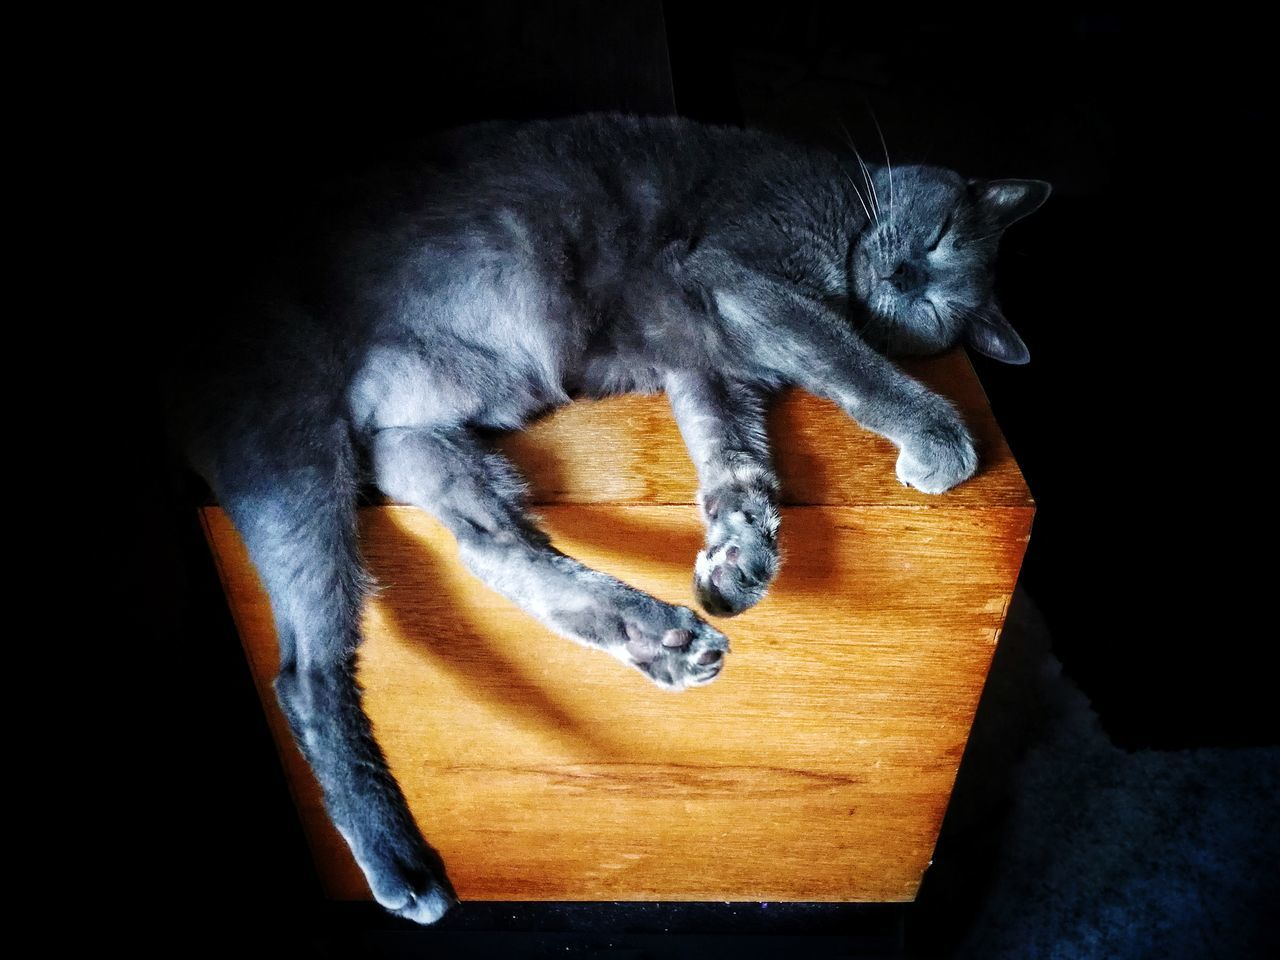 Sleeping cat 🌫️🐈🌫️ Animal Themes Mammal No People Indoors  Domestic Animals Cat Sleeping Sleeping Cat